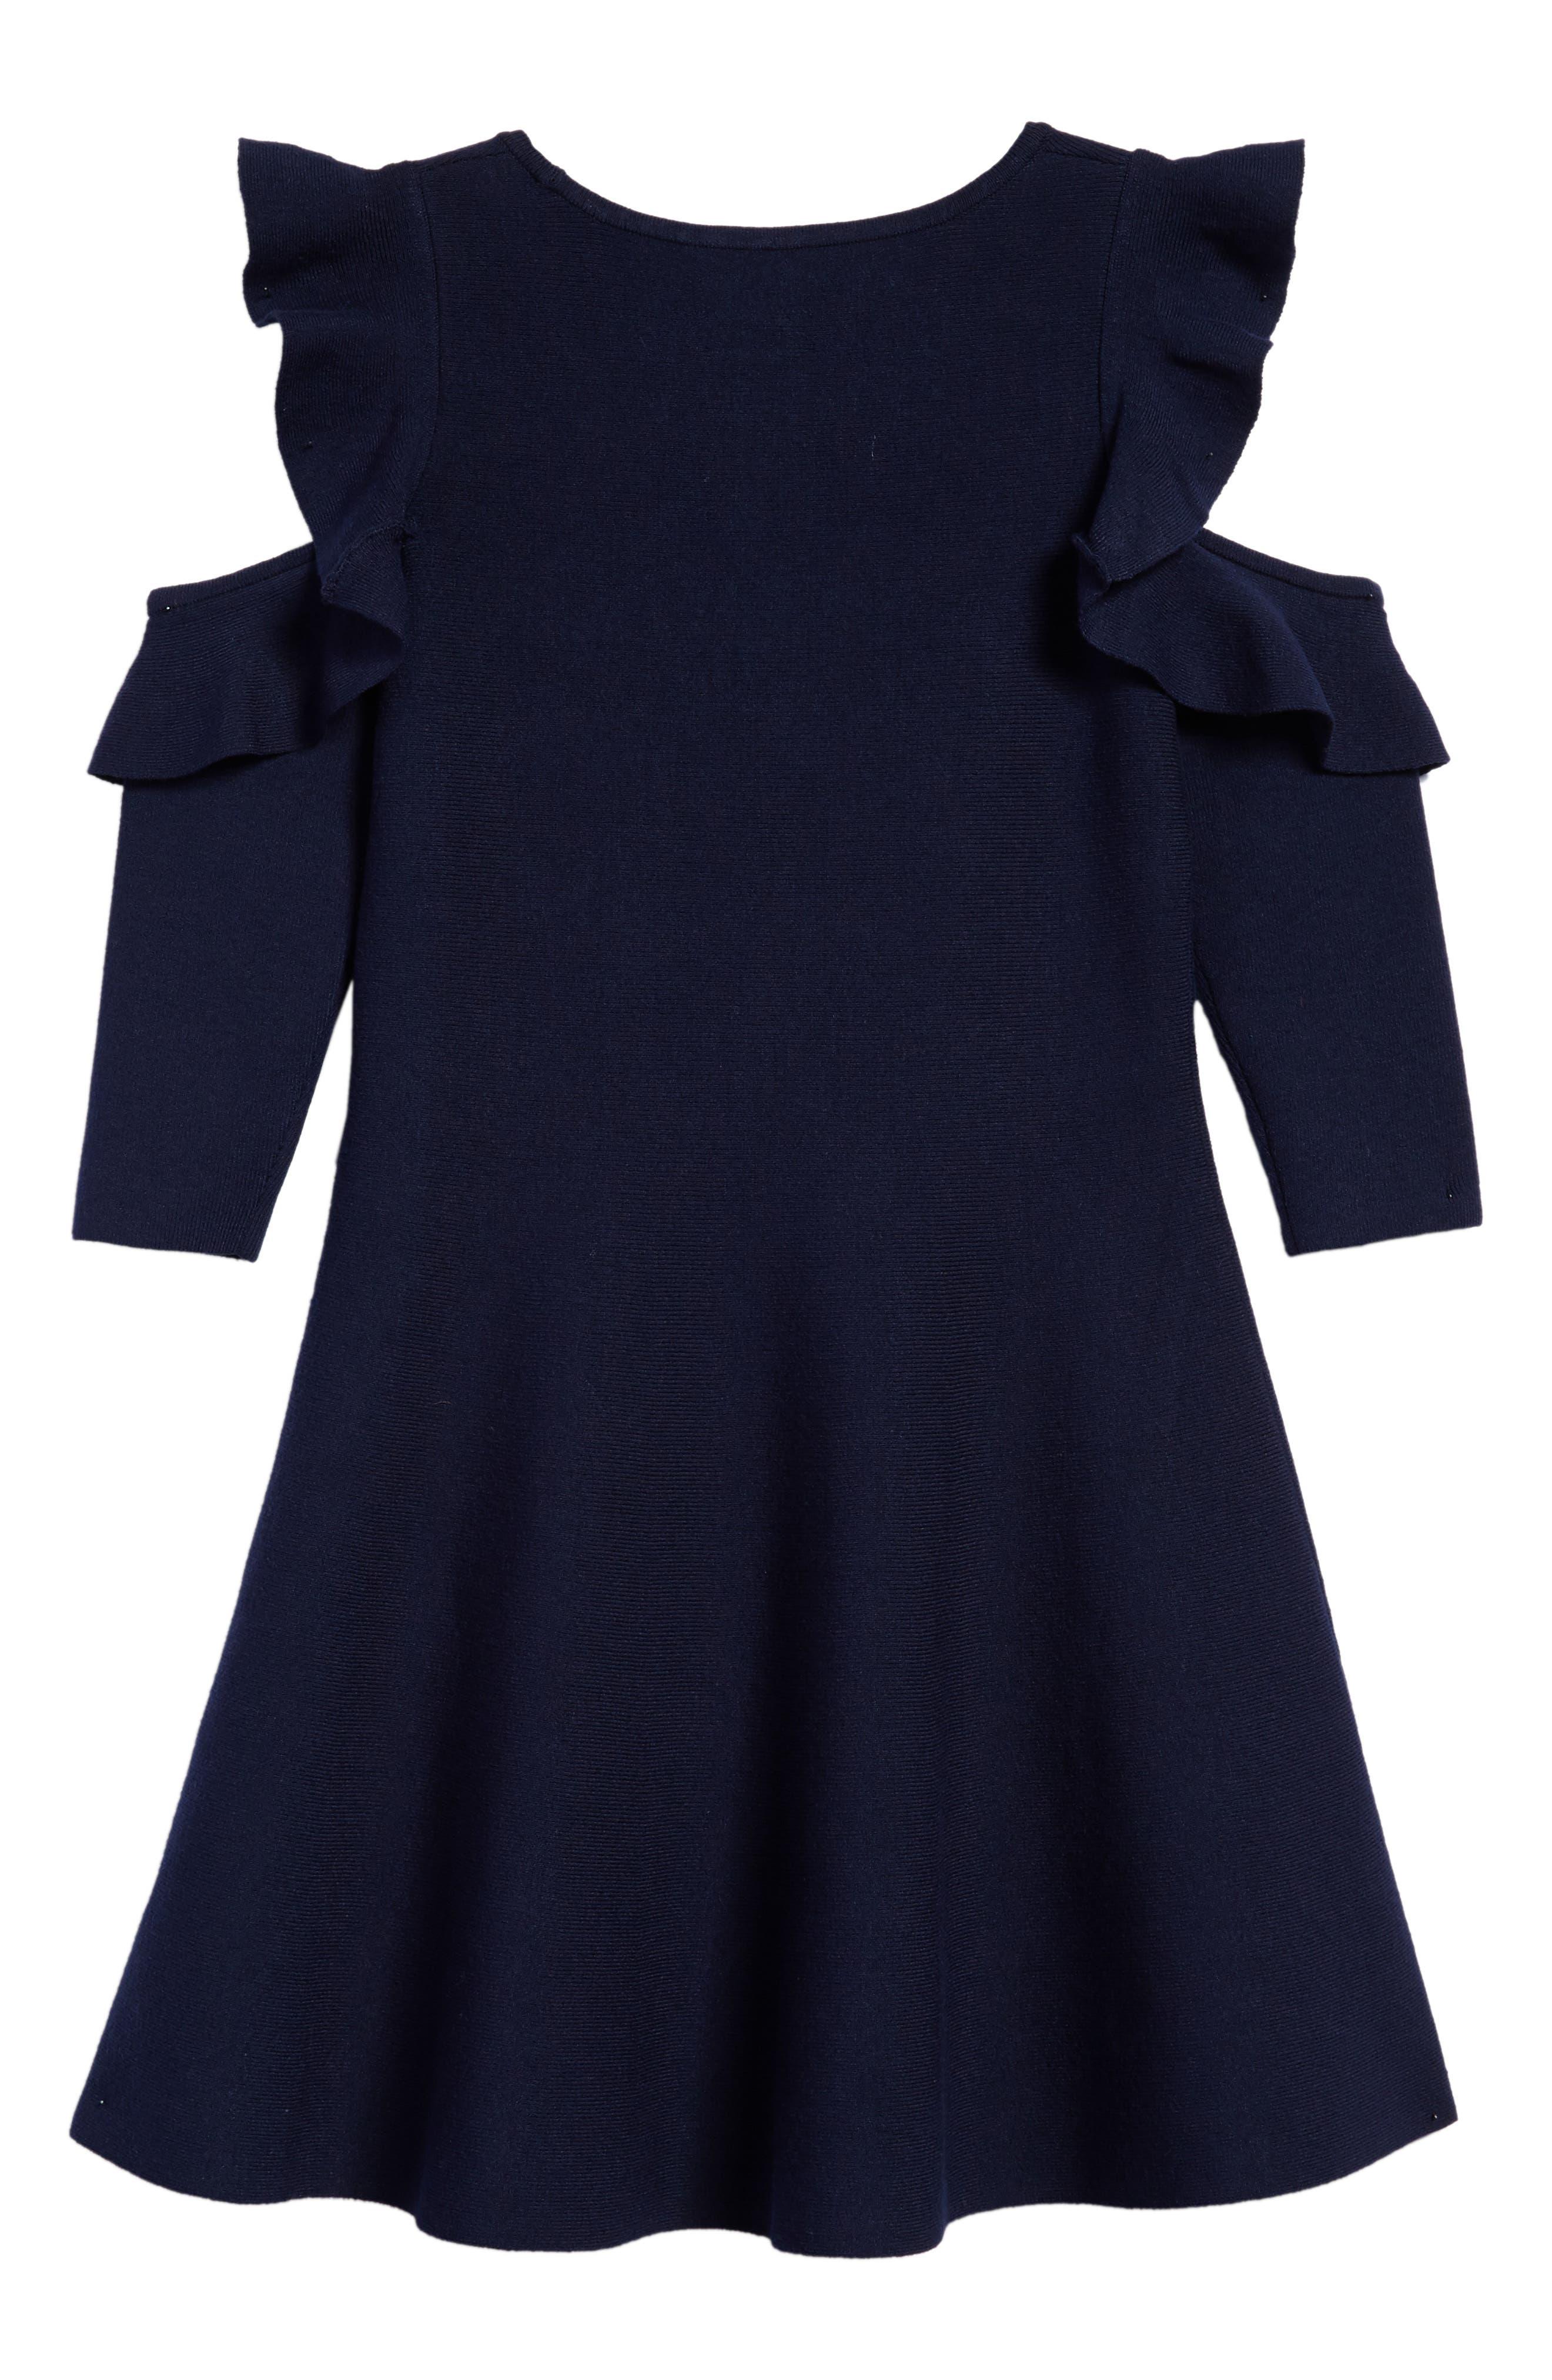 MILLY MINIS,                             Cold Shoulder Skater Dress,                             Alternate thumbnail 2, color,                             410